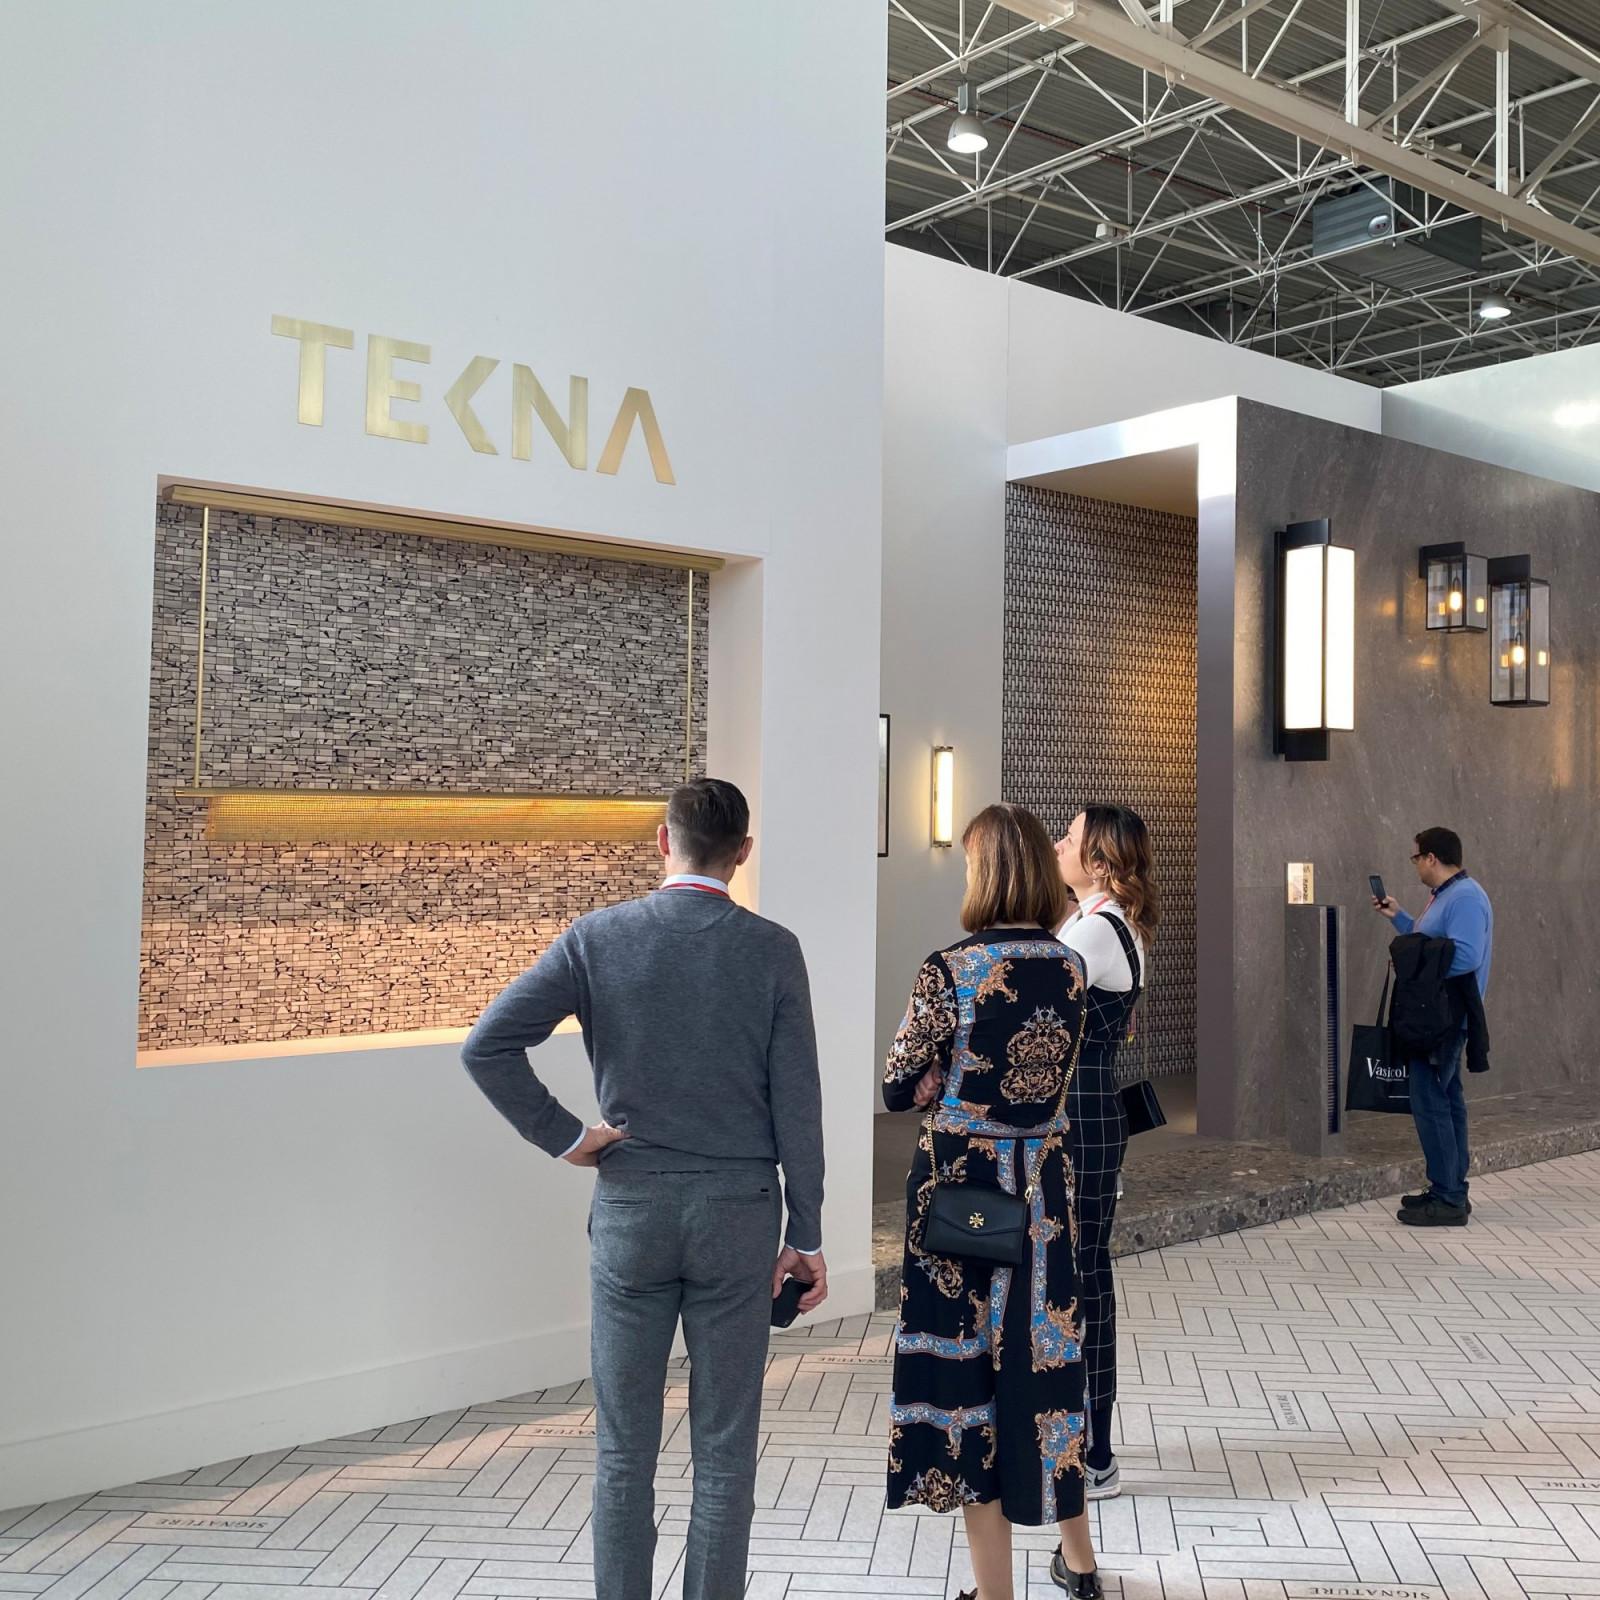 Tekna revealed its unique luminaires at M&O 2020